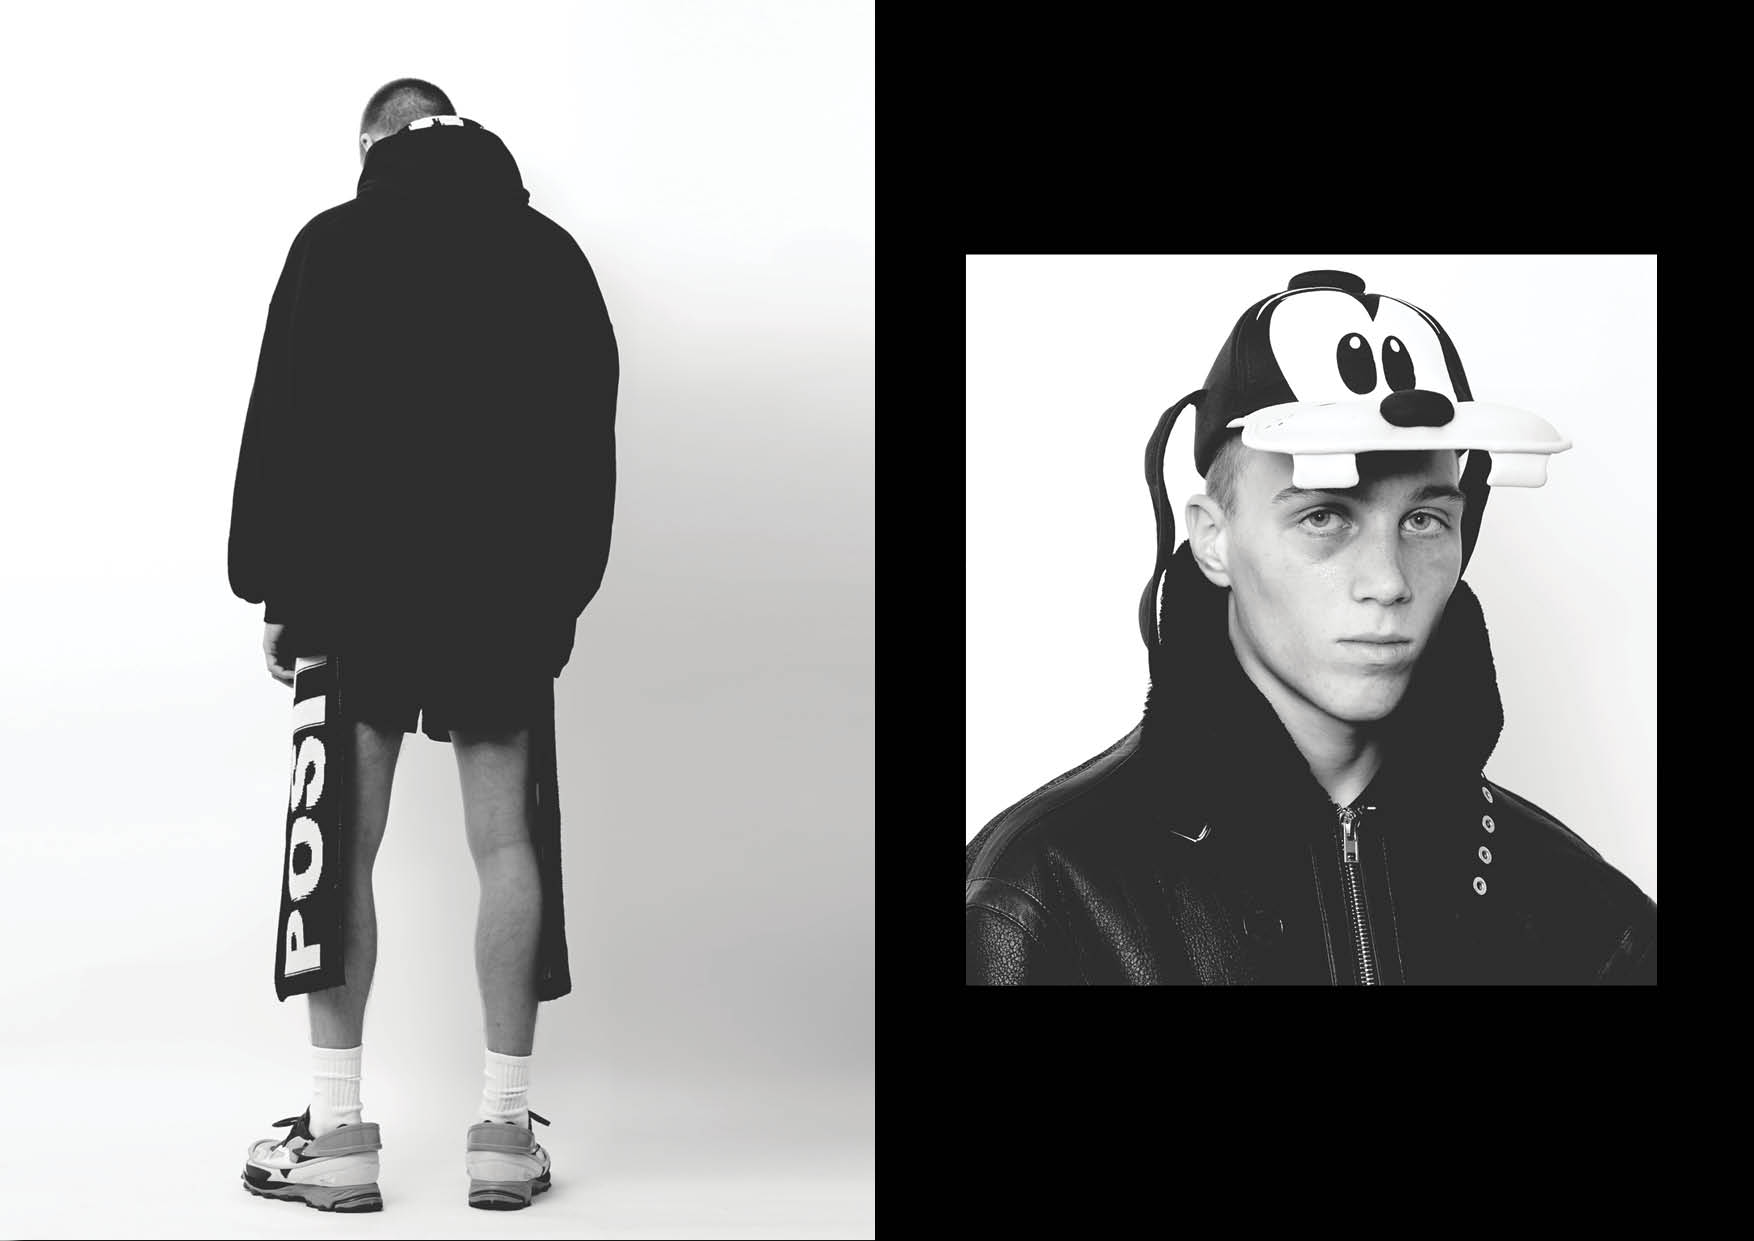 Left / Sweatshirt   Trasher  , shorts   Adidas  / scarf   Etudes   and sneakers   Raf simons x adidas   Right / Jacket  Vetements  and cap  Disney